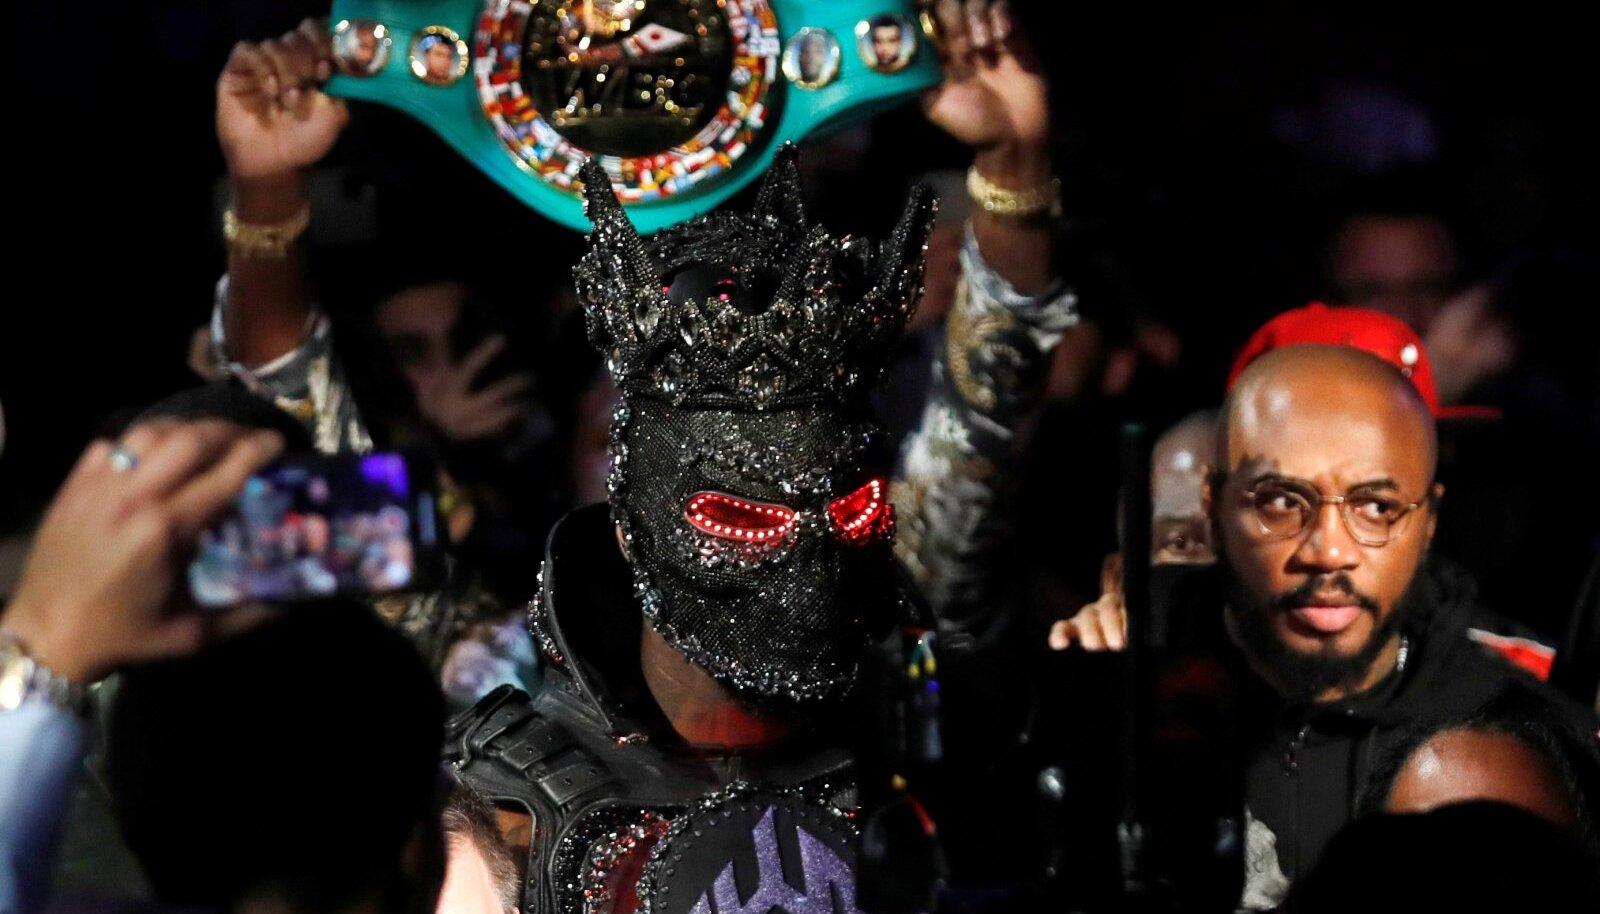 Deontay Wilder kostüümis, millega ta sammus ringi enne matši Tyson Fury'ga.